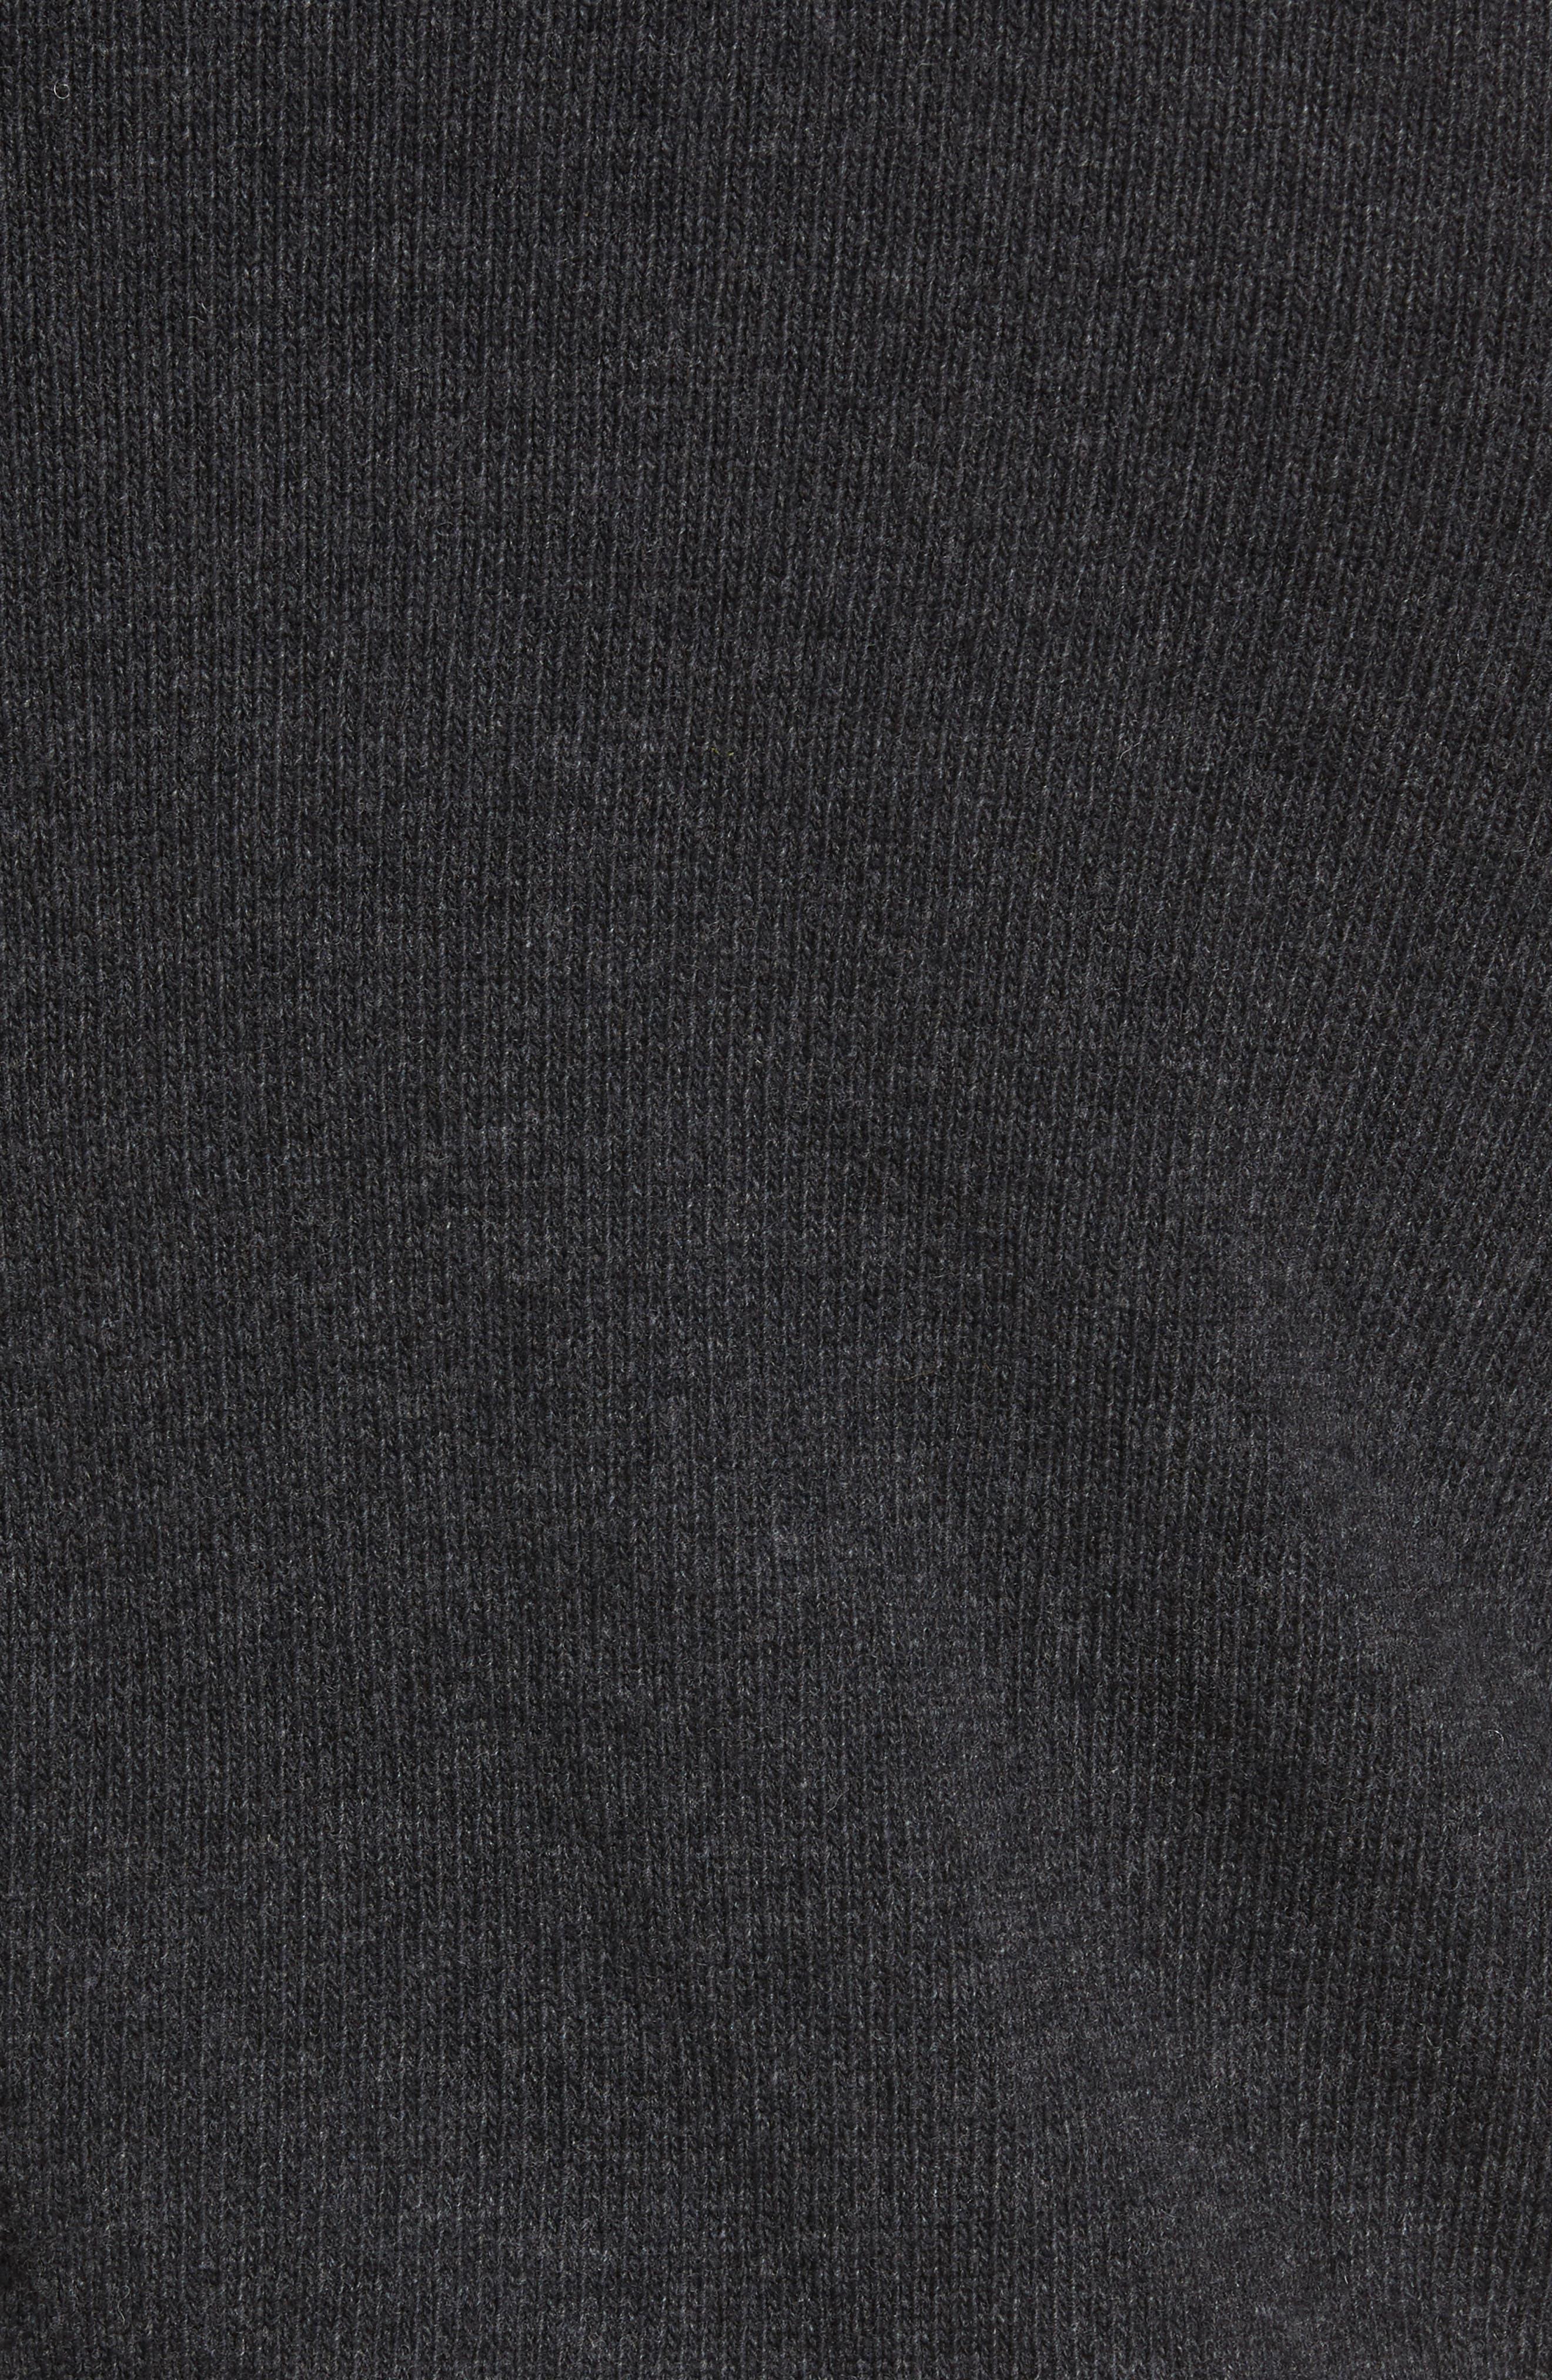 Culzean Wool Jacket,                             Alternate thumbnail 5, color,                             010